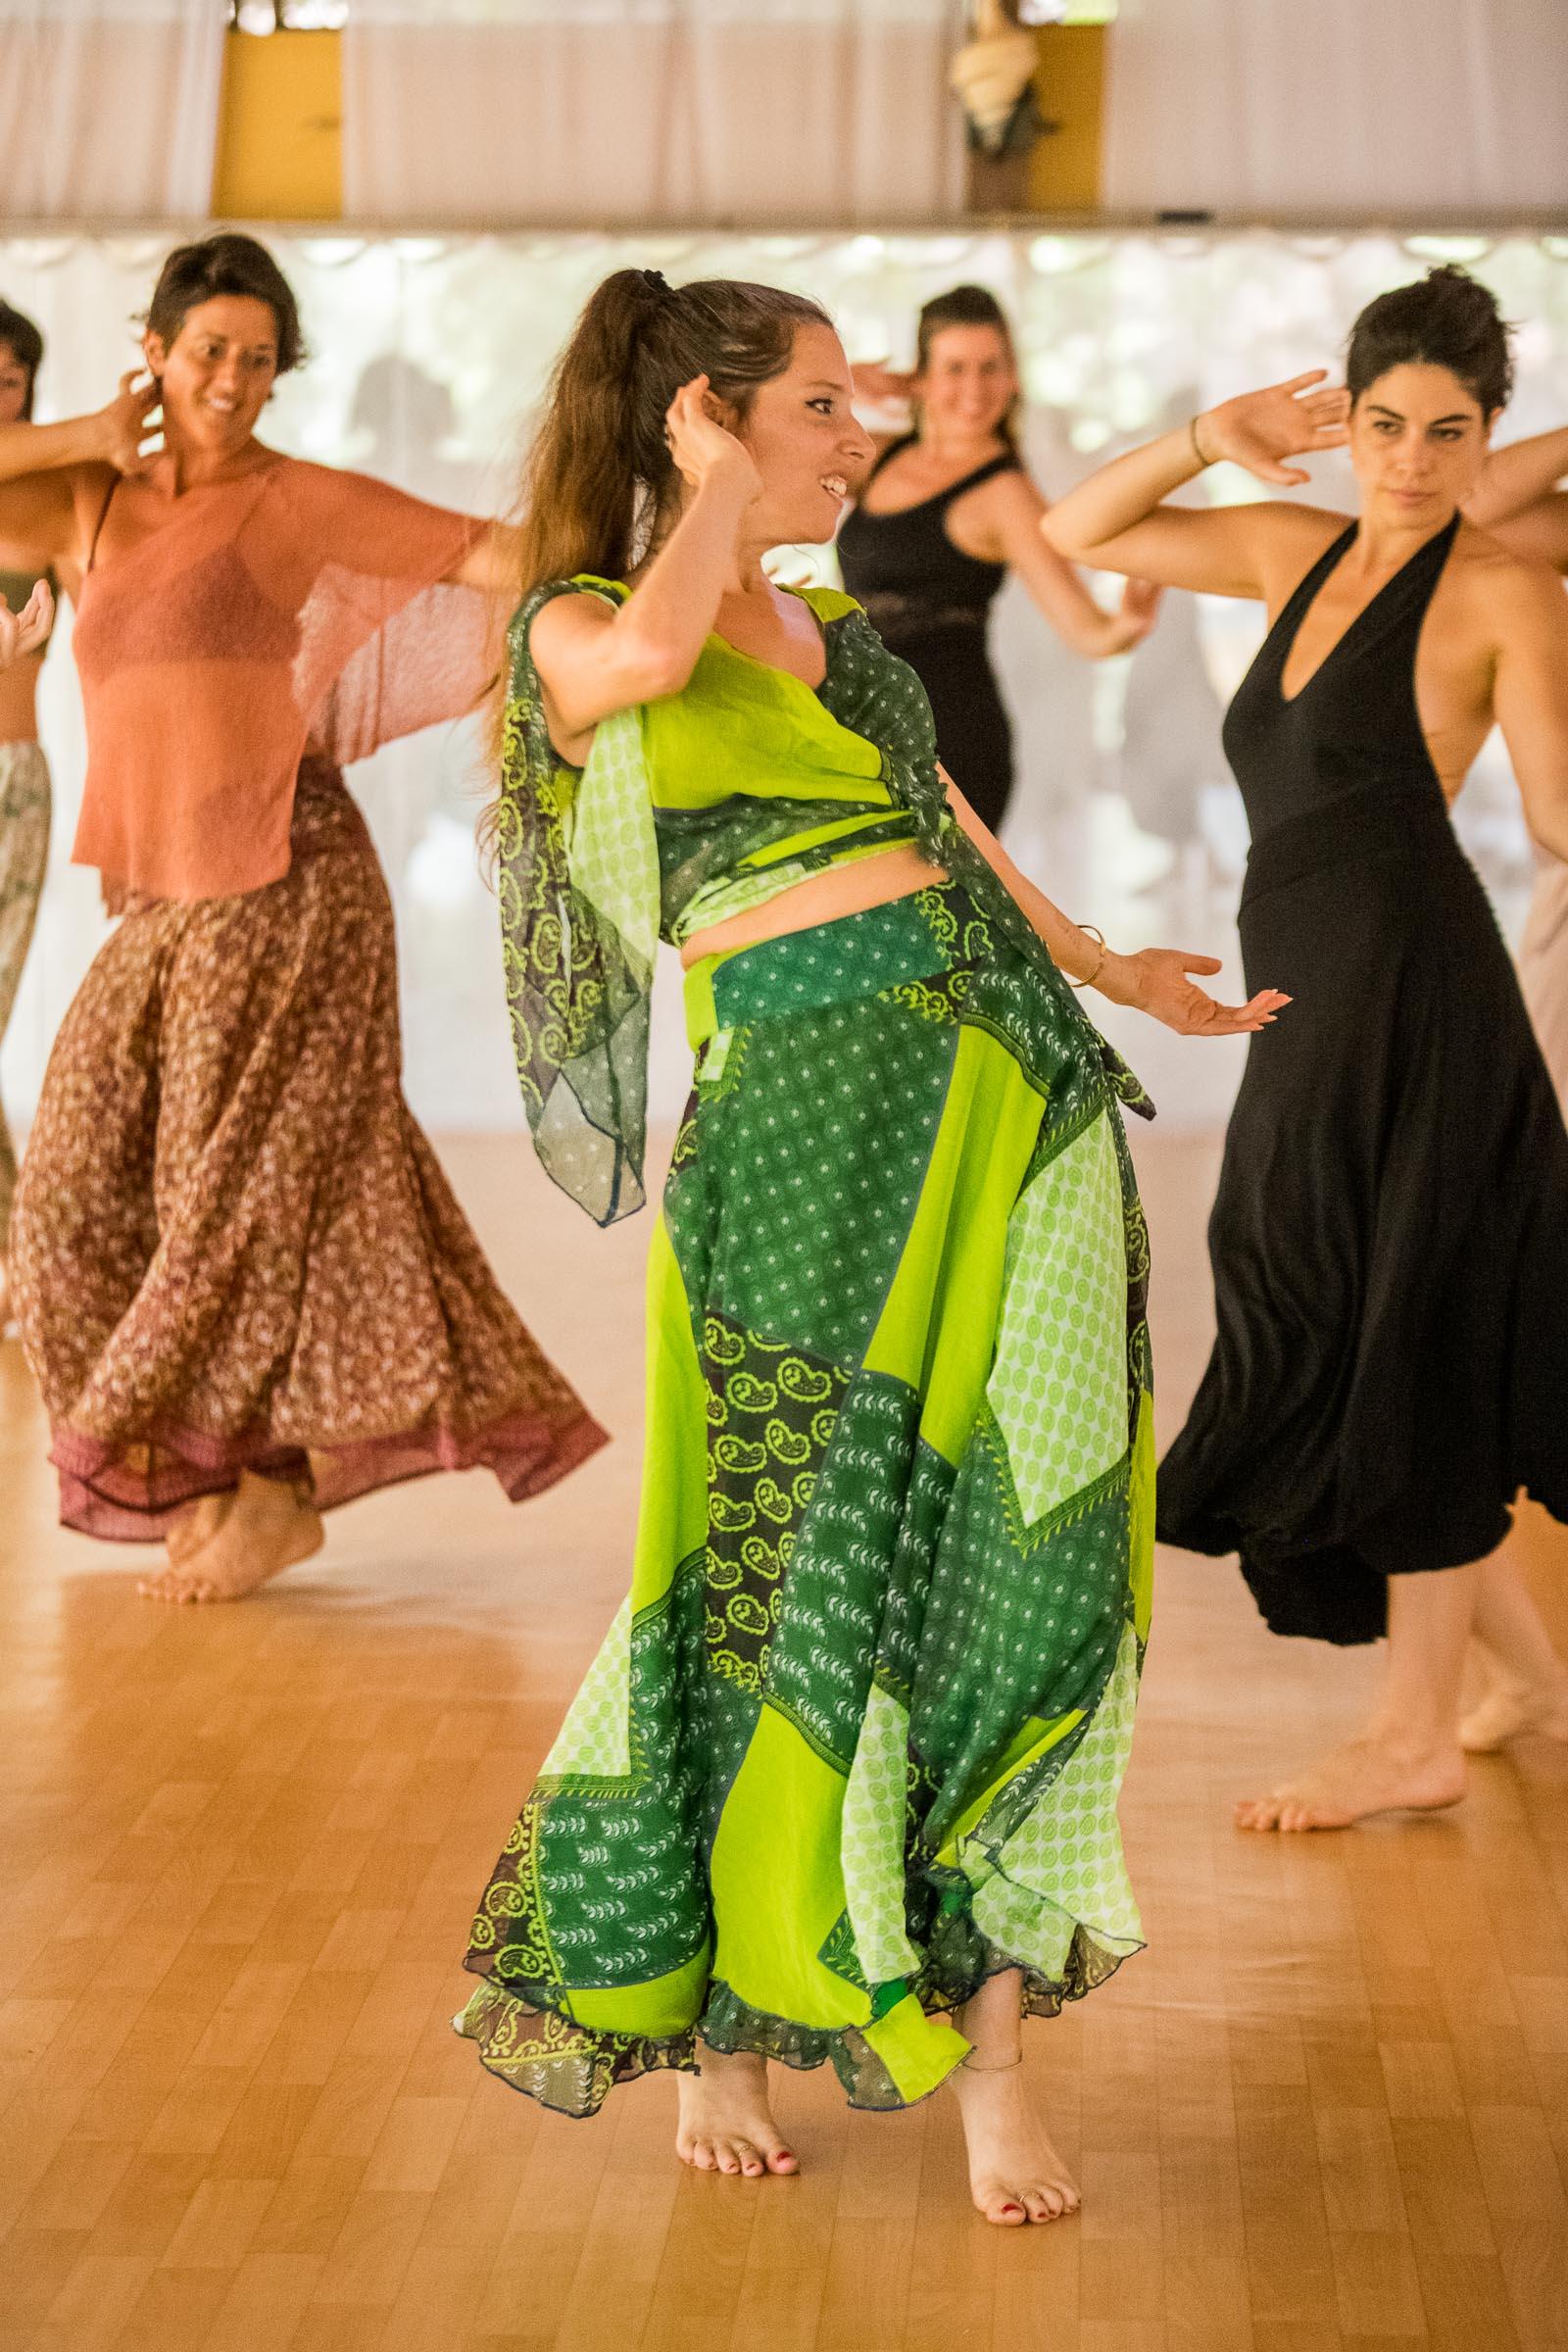 Sacred Dance & Feminine Arts workshop with Zola Dubnikova